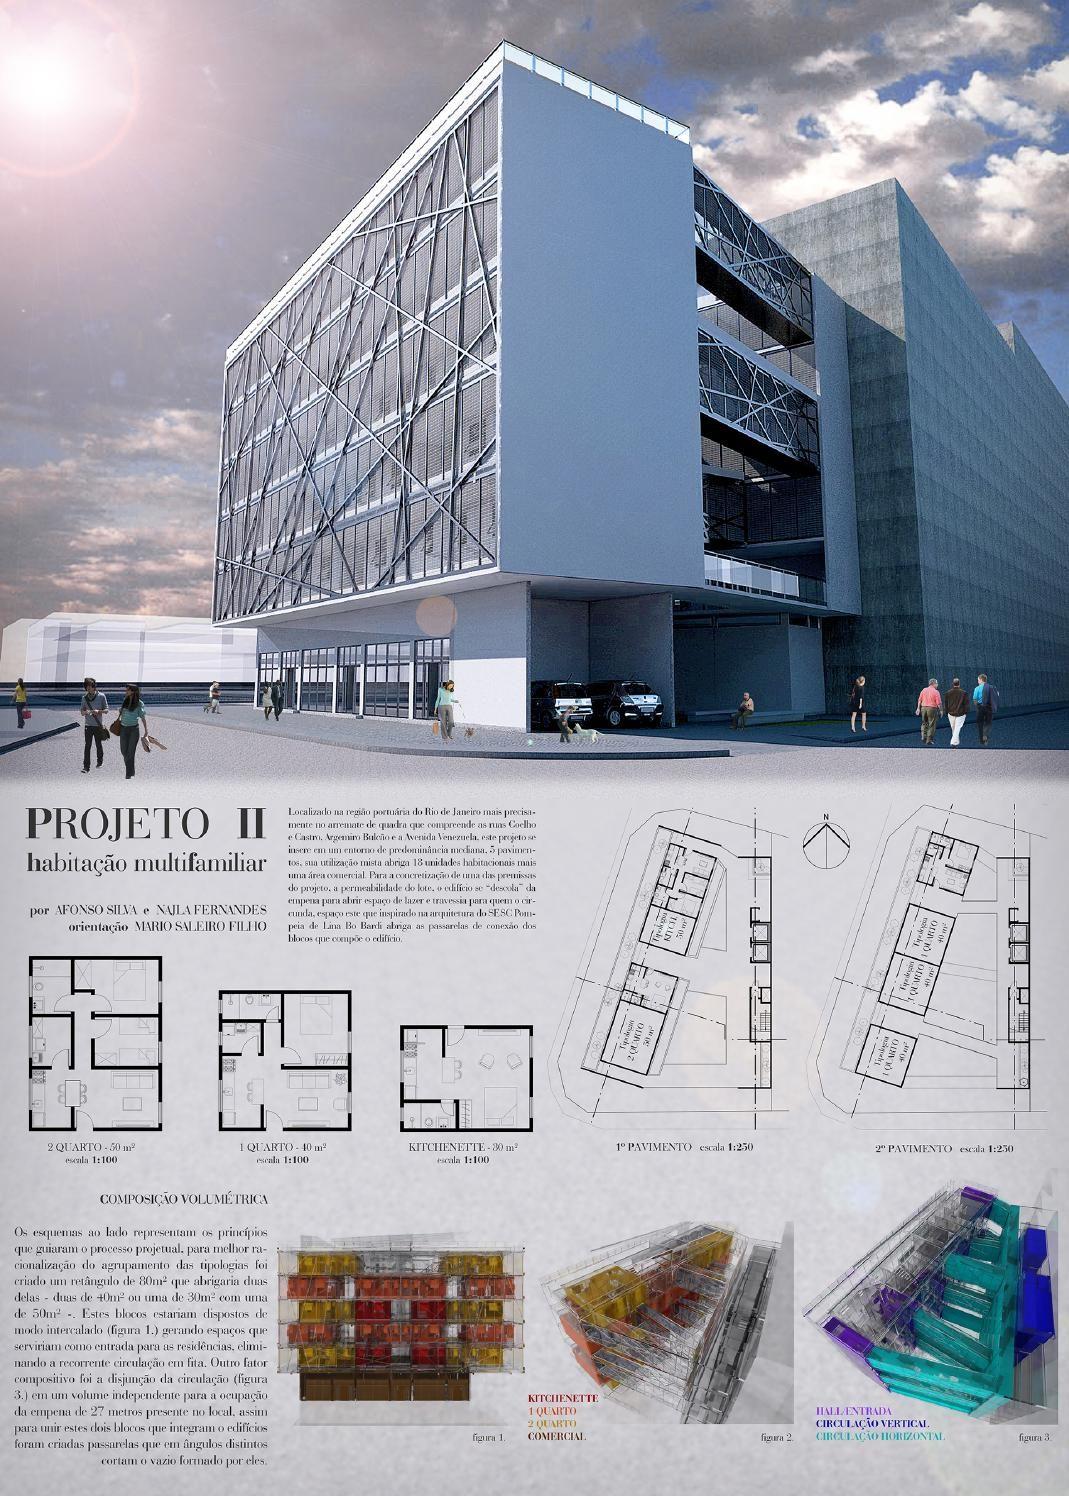 Excepcional Habitação multifamiliar - Banner | Projeto de arquitetura  VI52